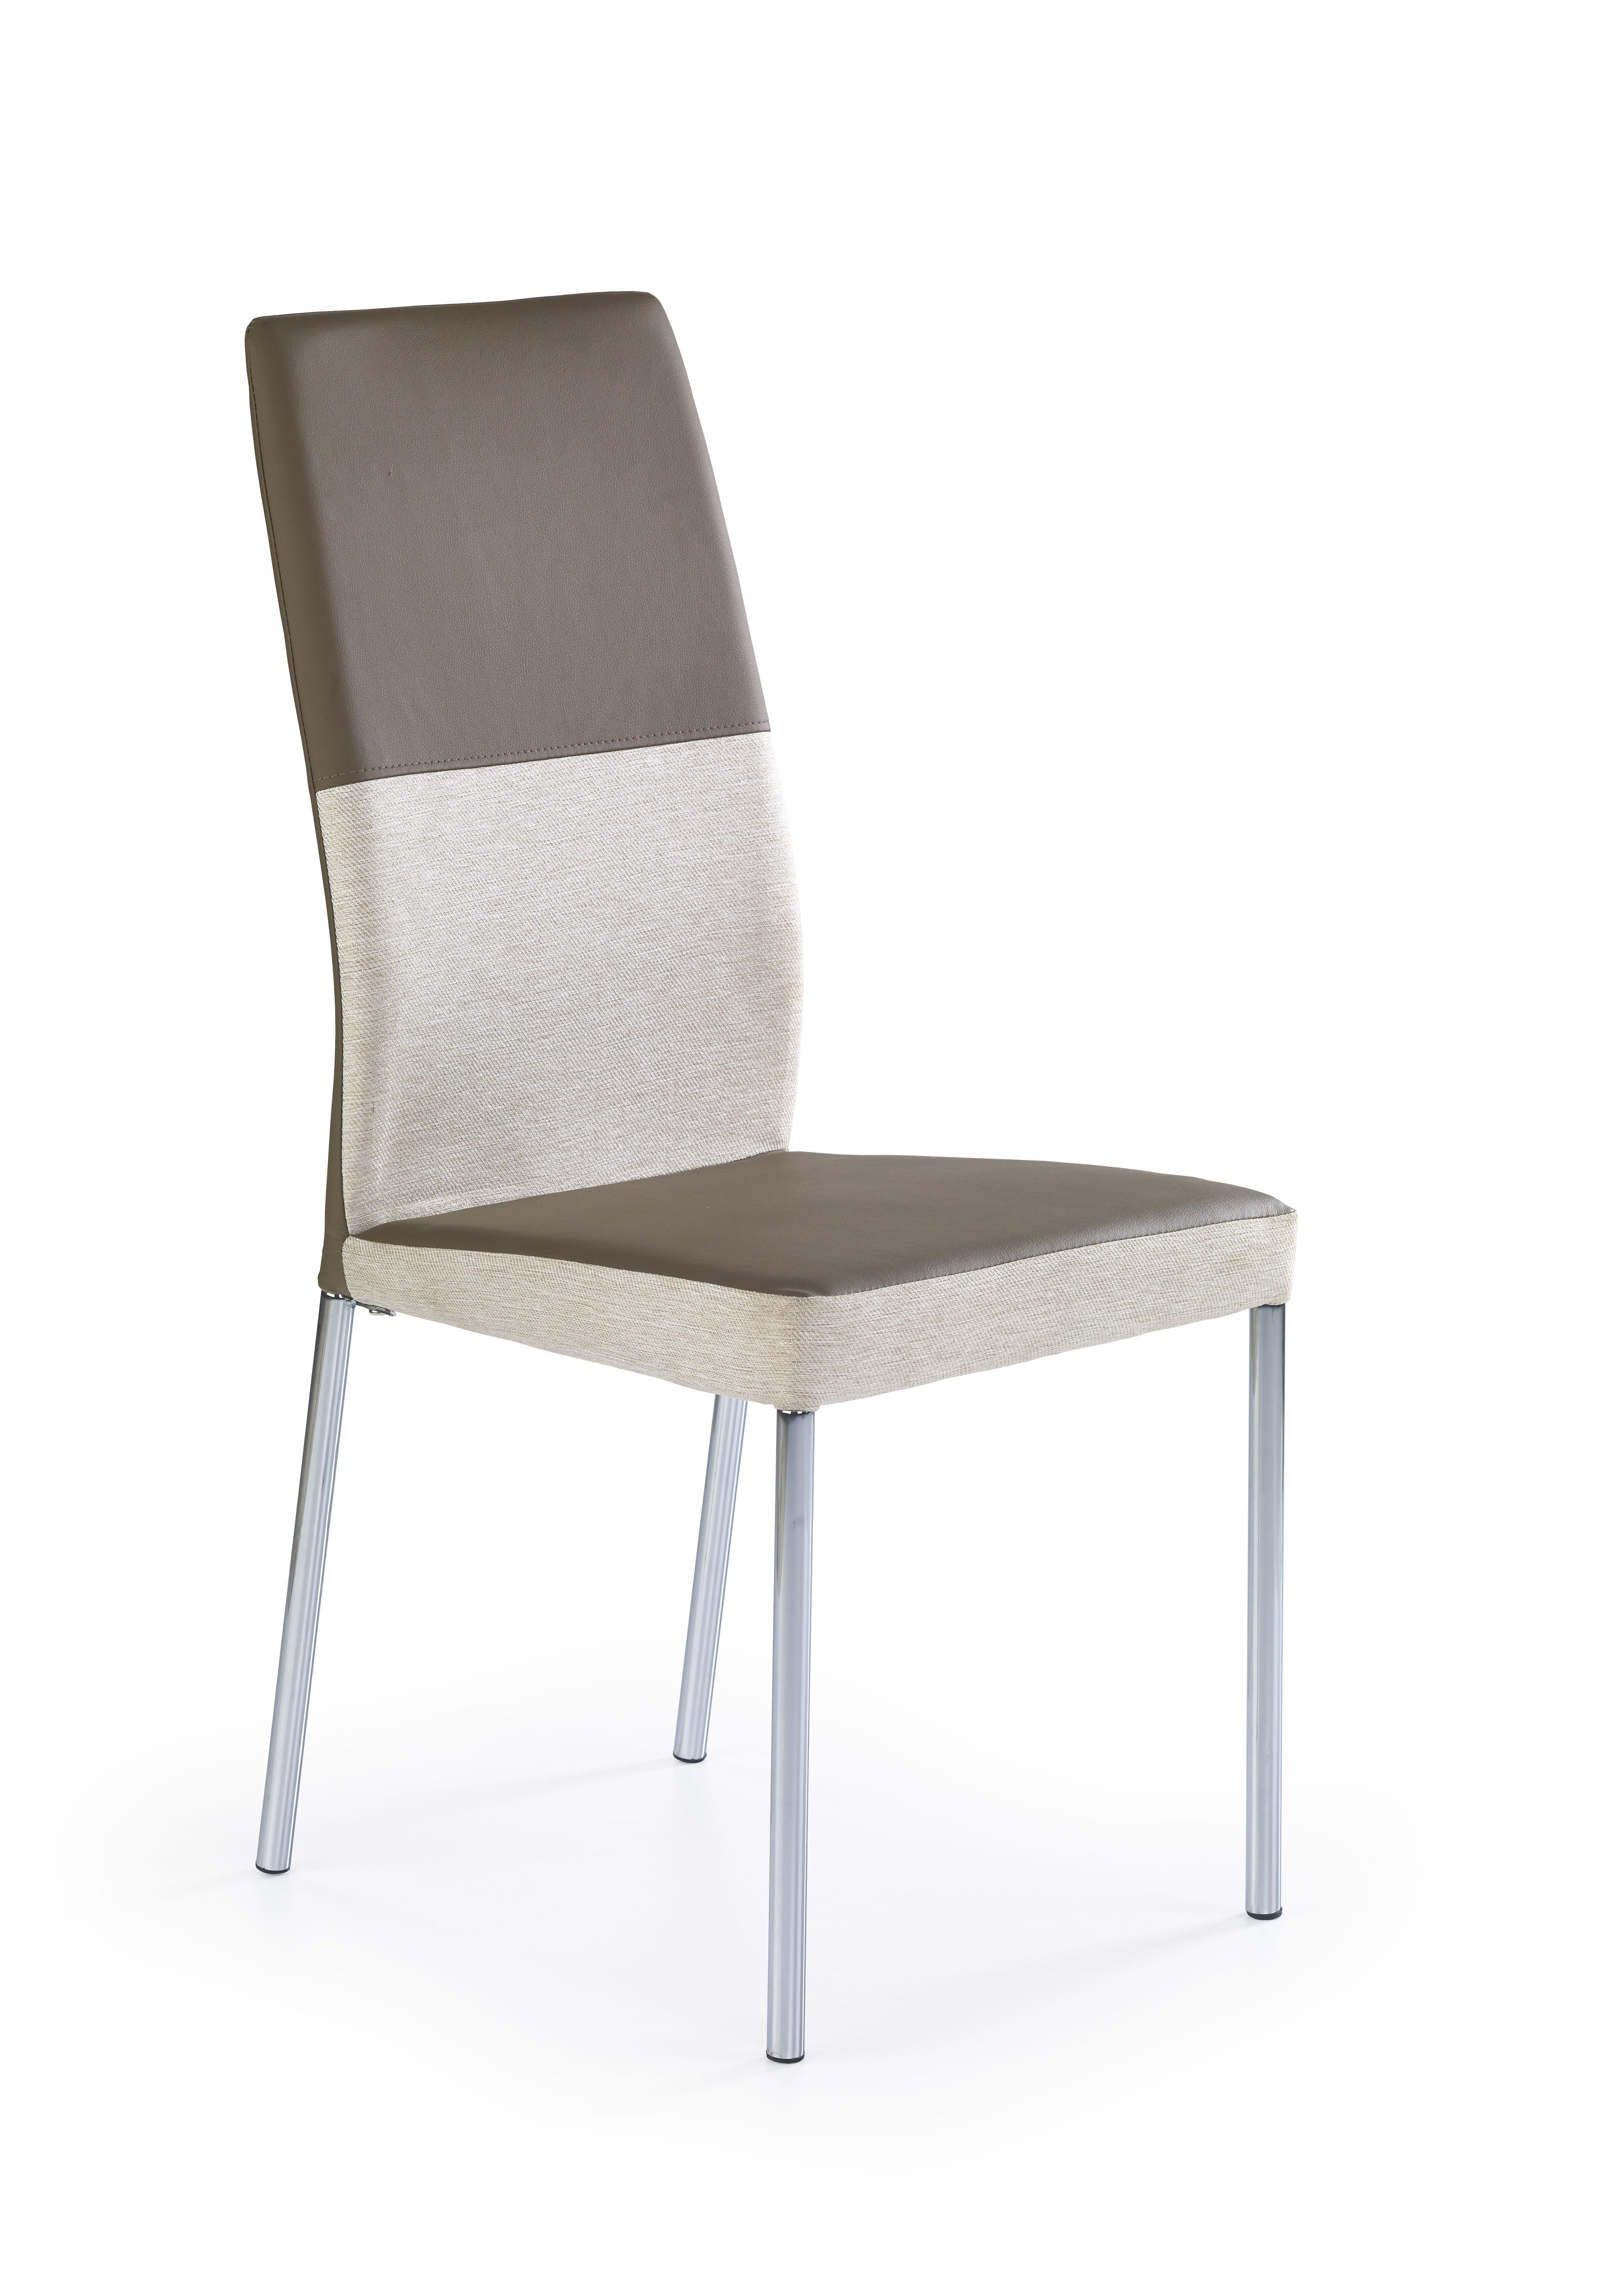 Jedálenská stolička - Halmar - K 173 béžová + svetlohnedá